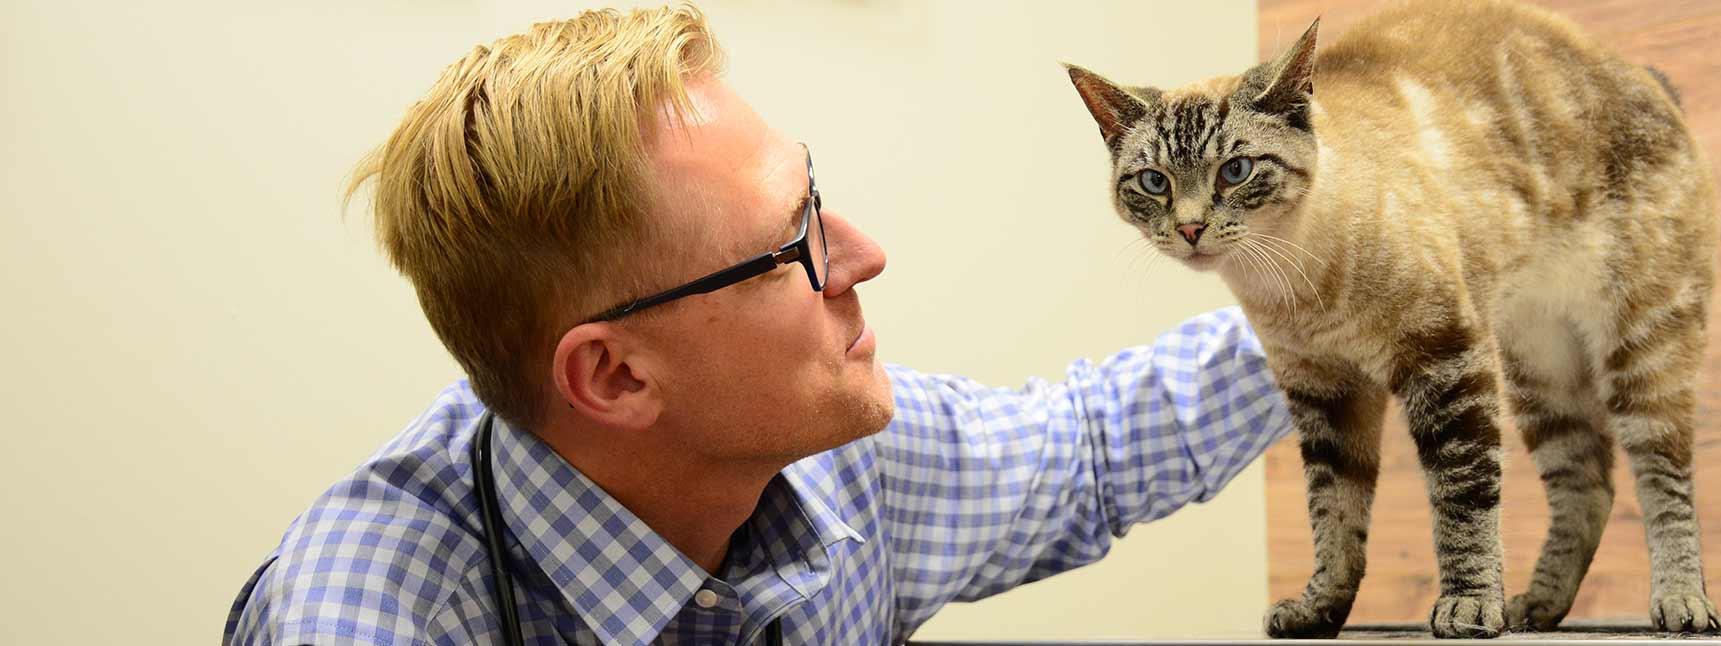 Veterinary care in Franklin TN